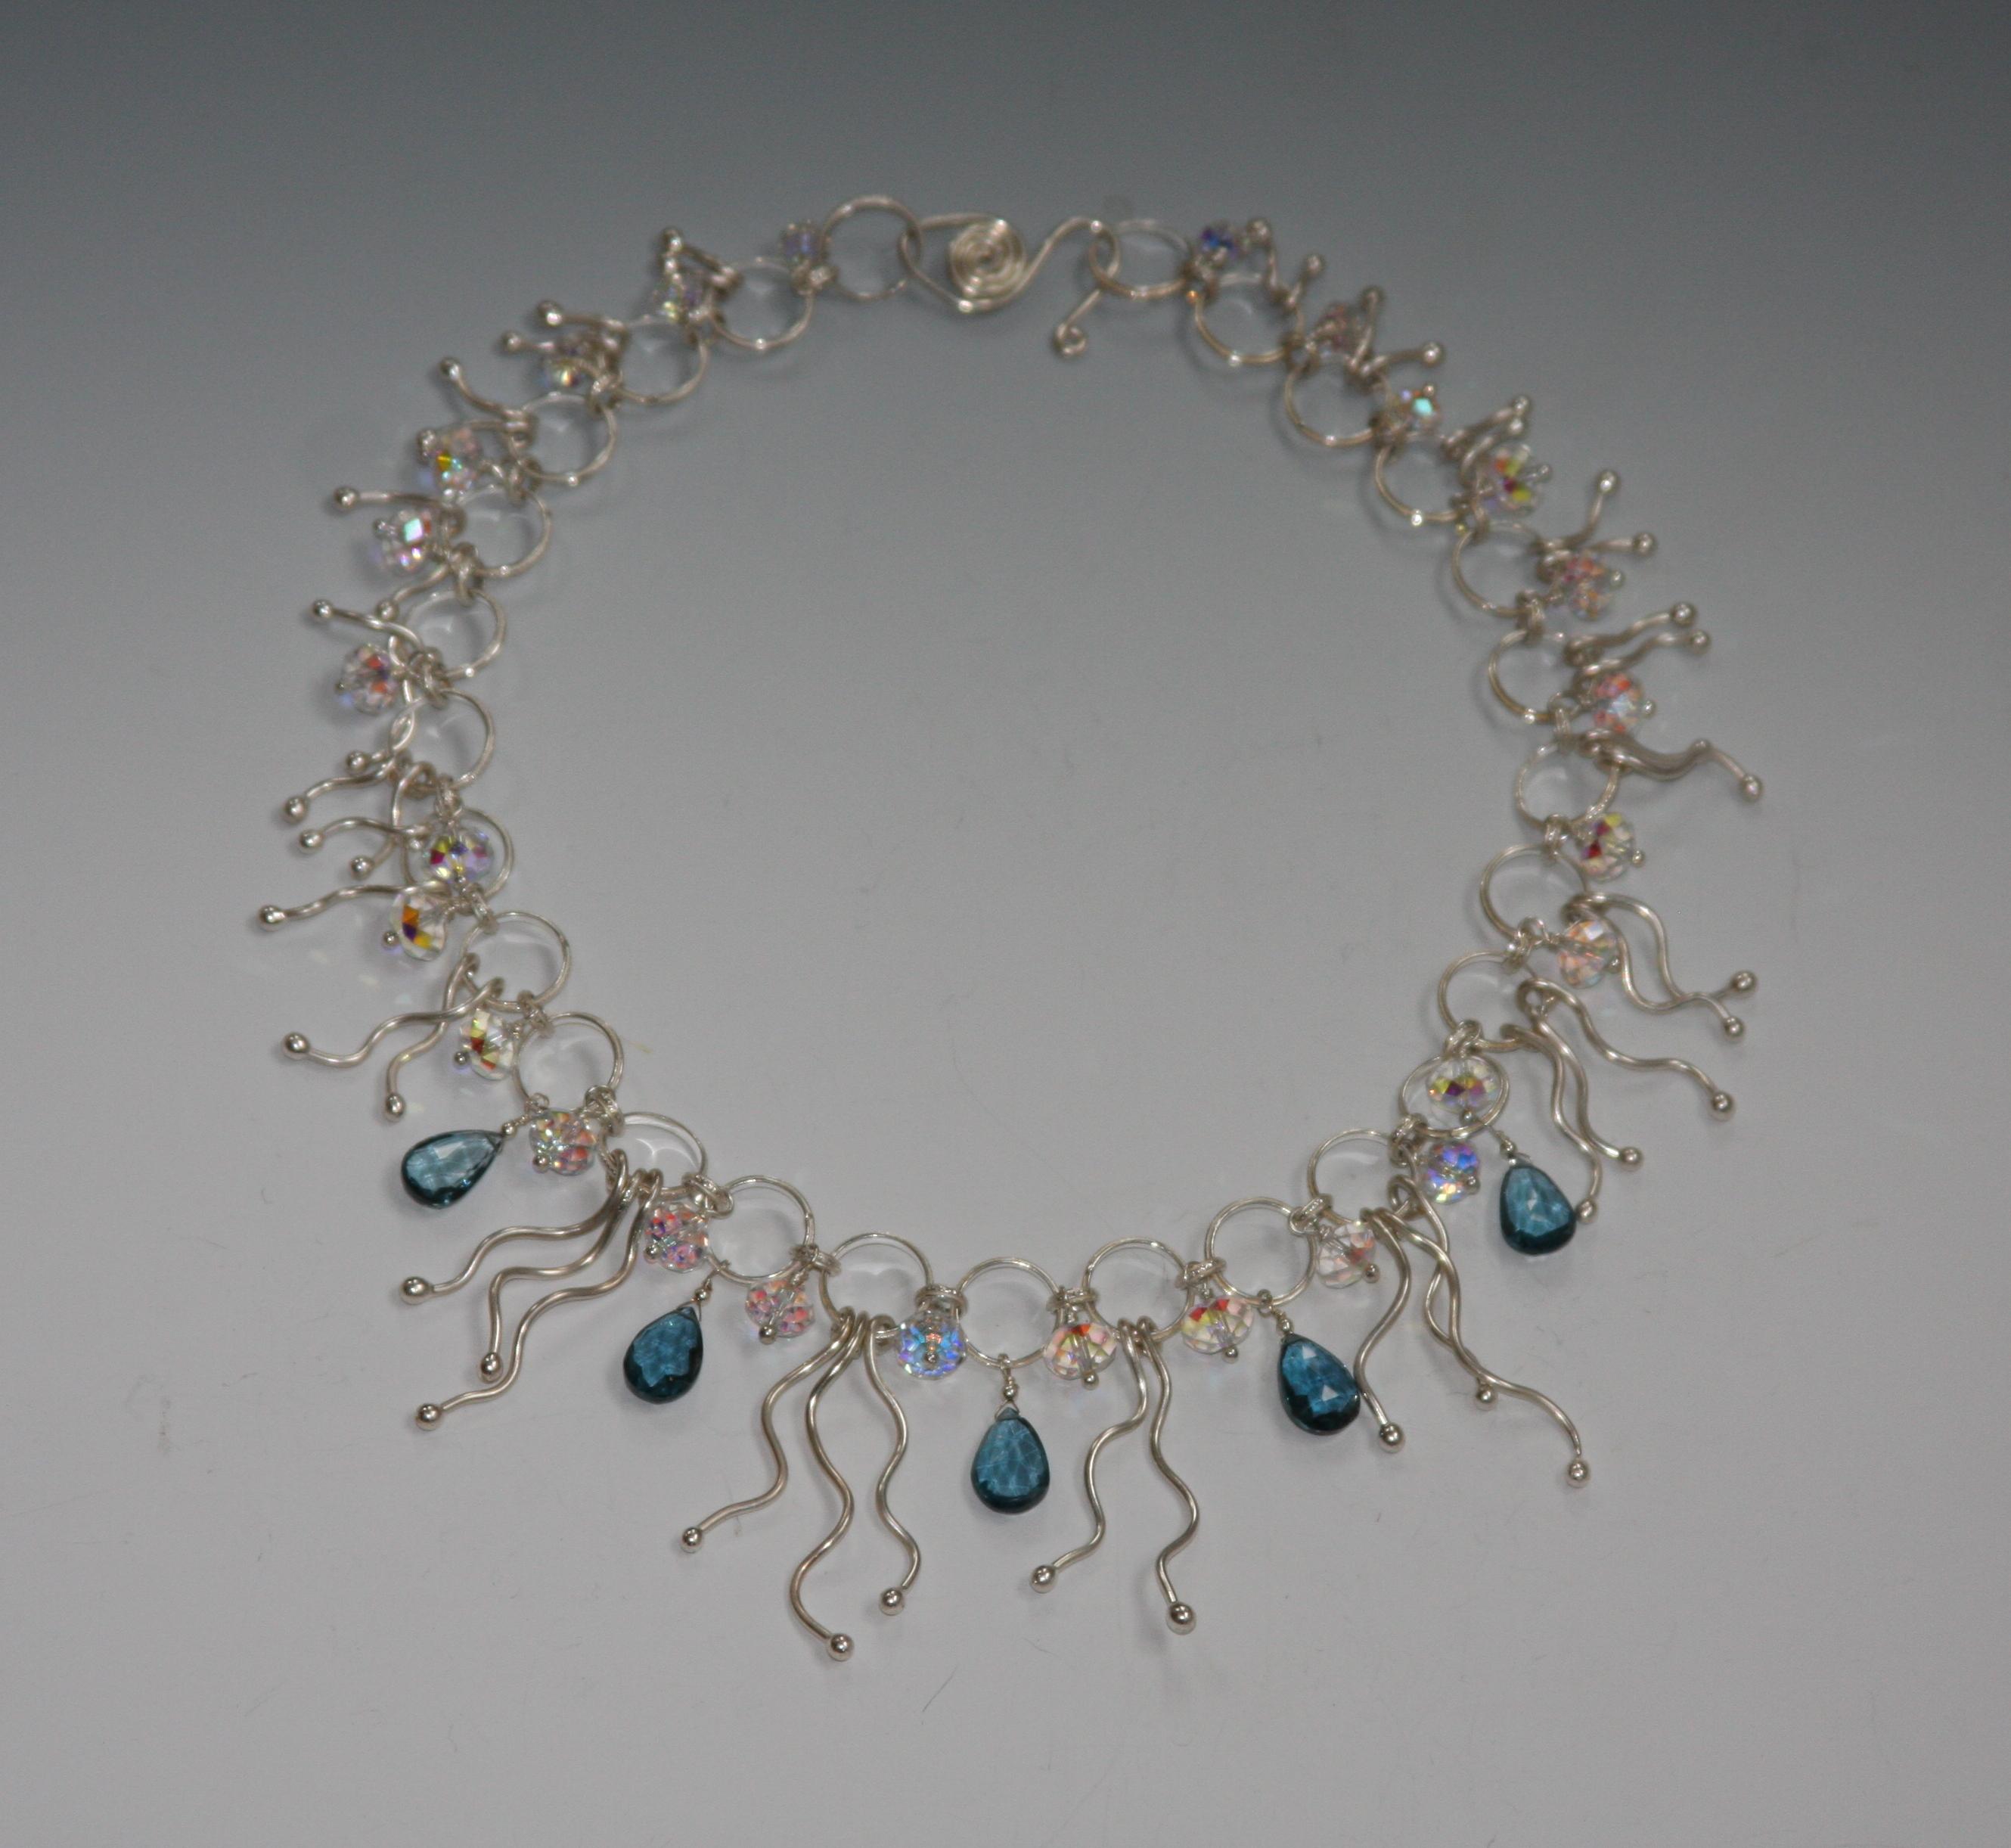 Blue Topaz - About Blue topaz, London blue topaz | Jewelry Making ...